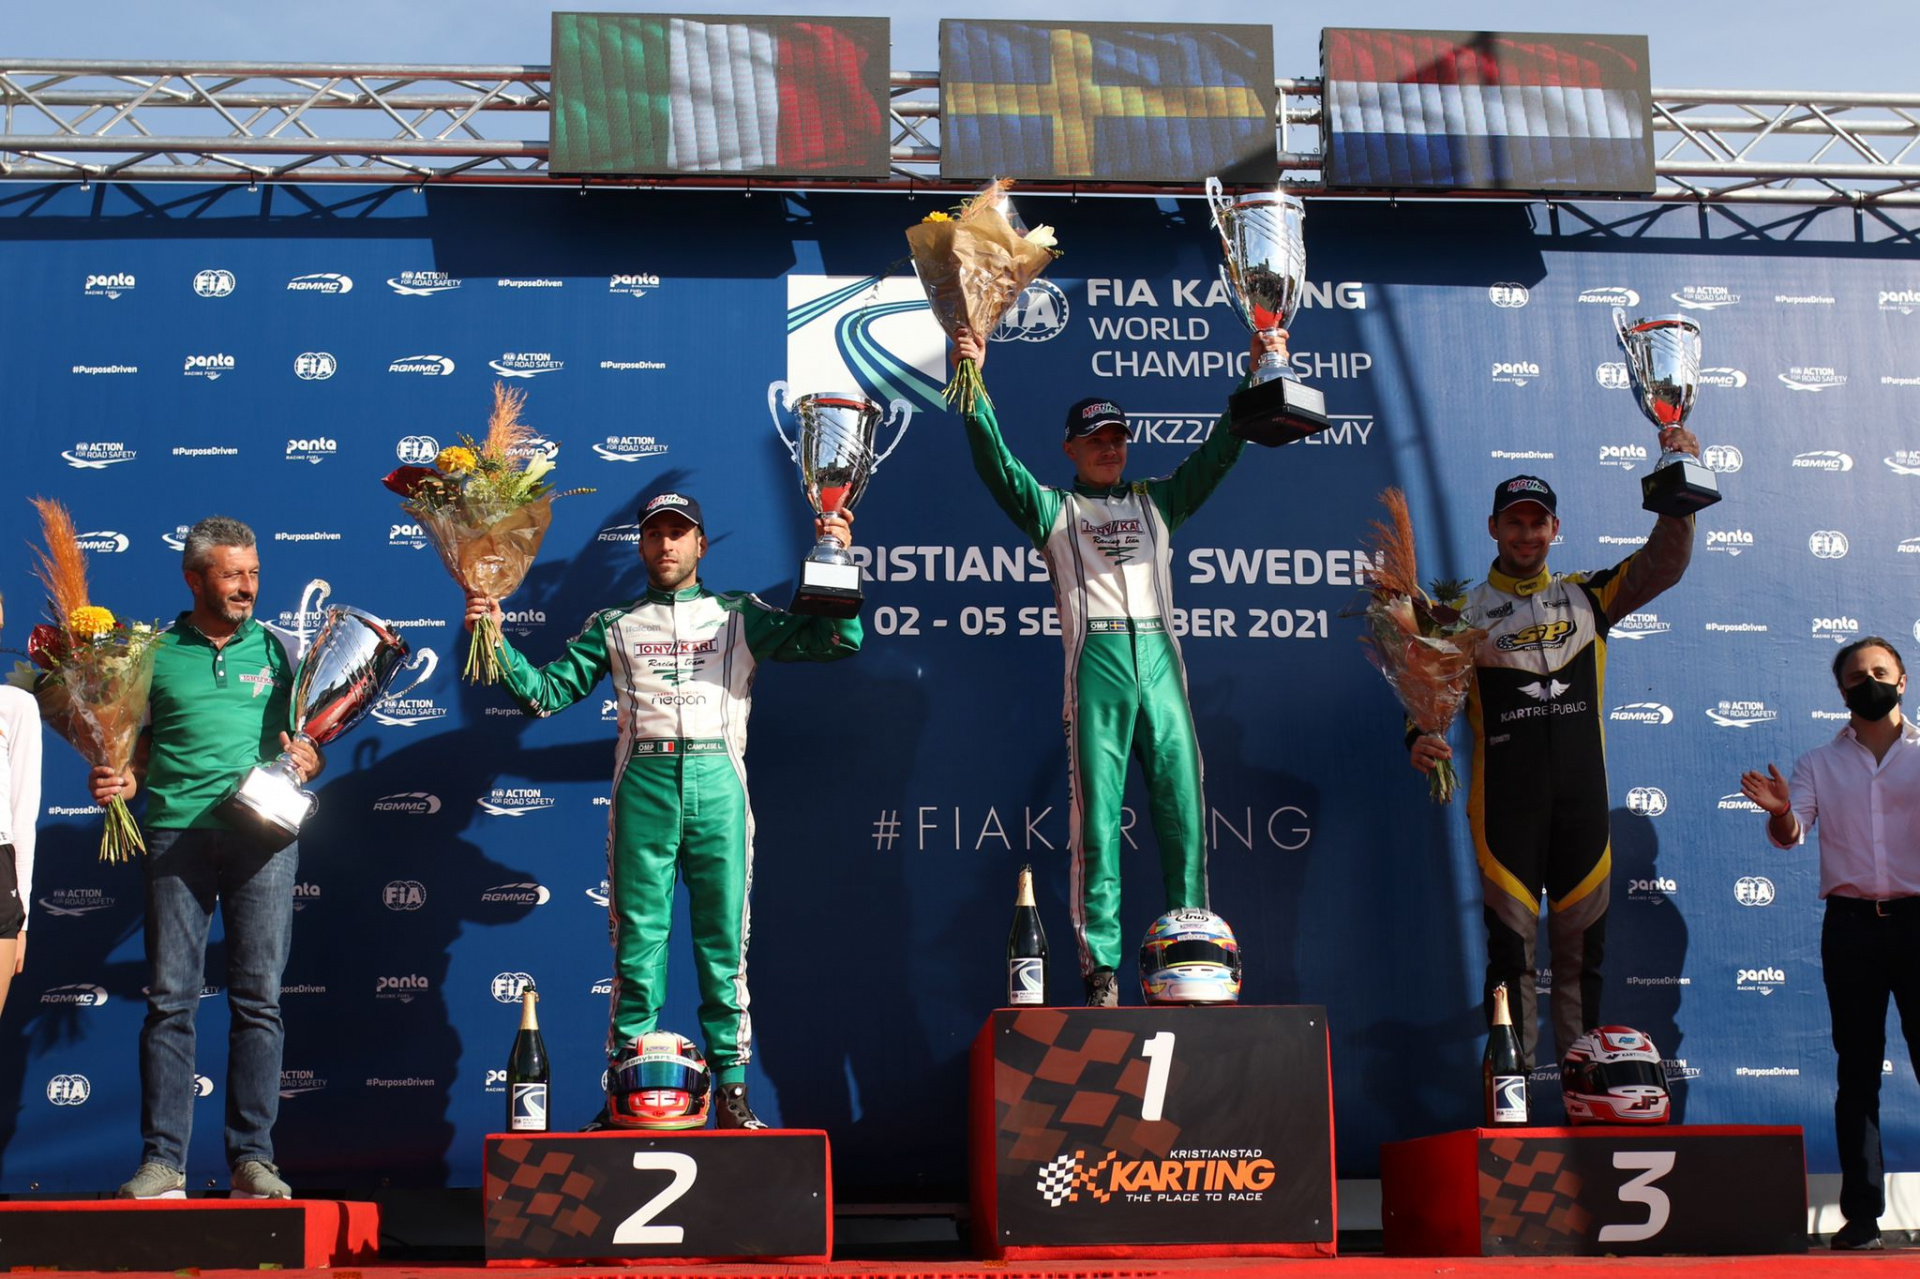 FIA World Championship KZ/KZ2 - Milell and Travisanutto the new Champions